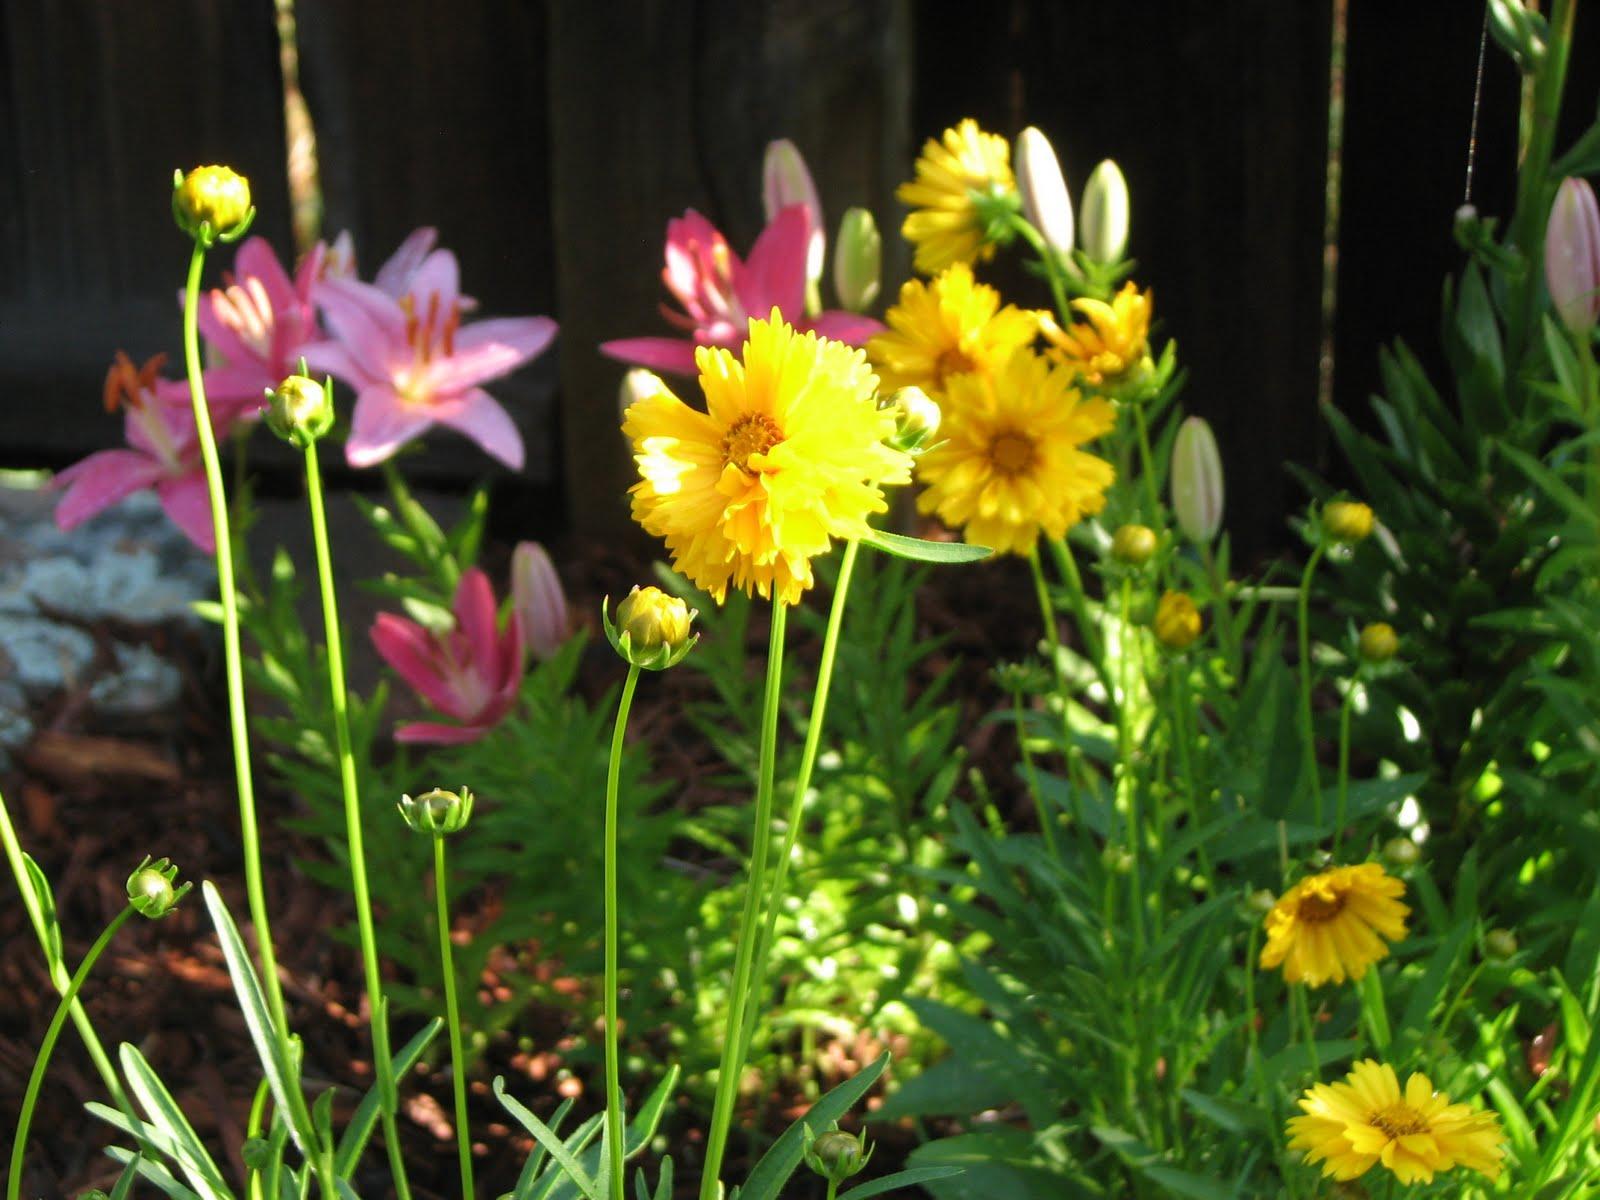 Native Flower Plants | Flower Gardening Made Easy For A Beginner To Achieve A Dream Garden